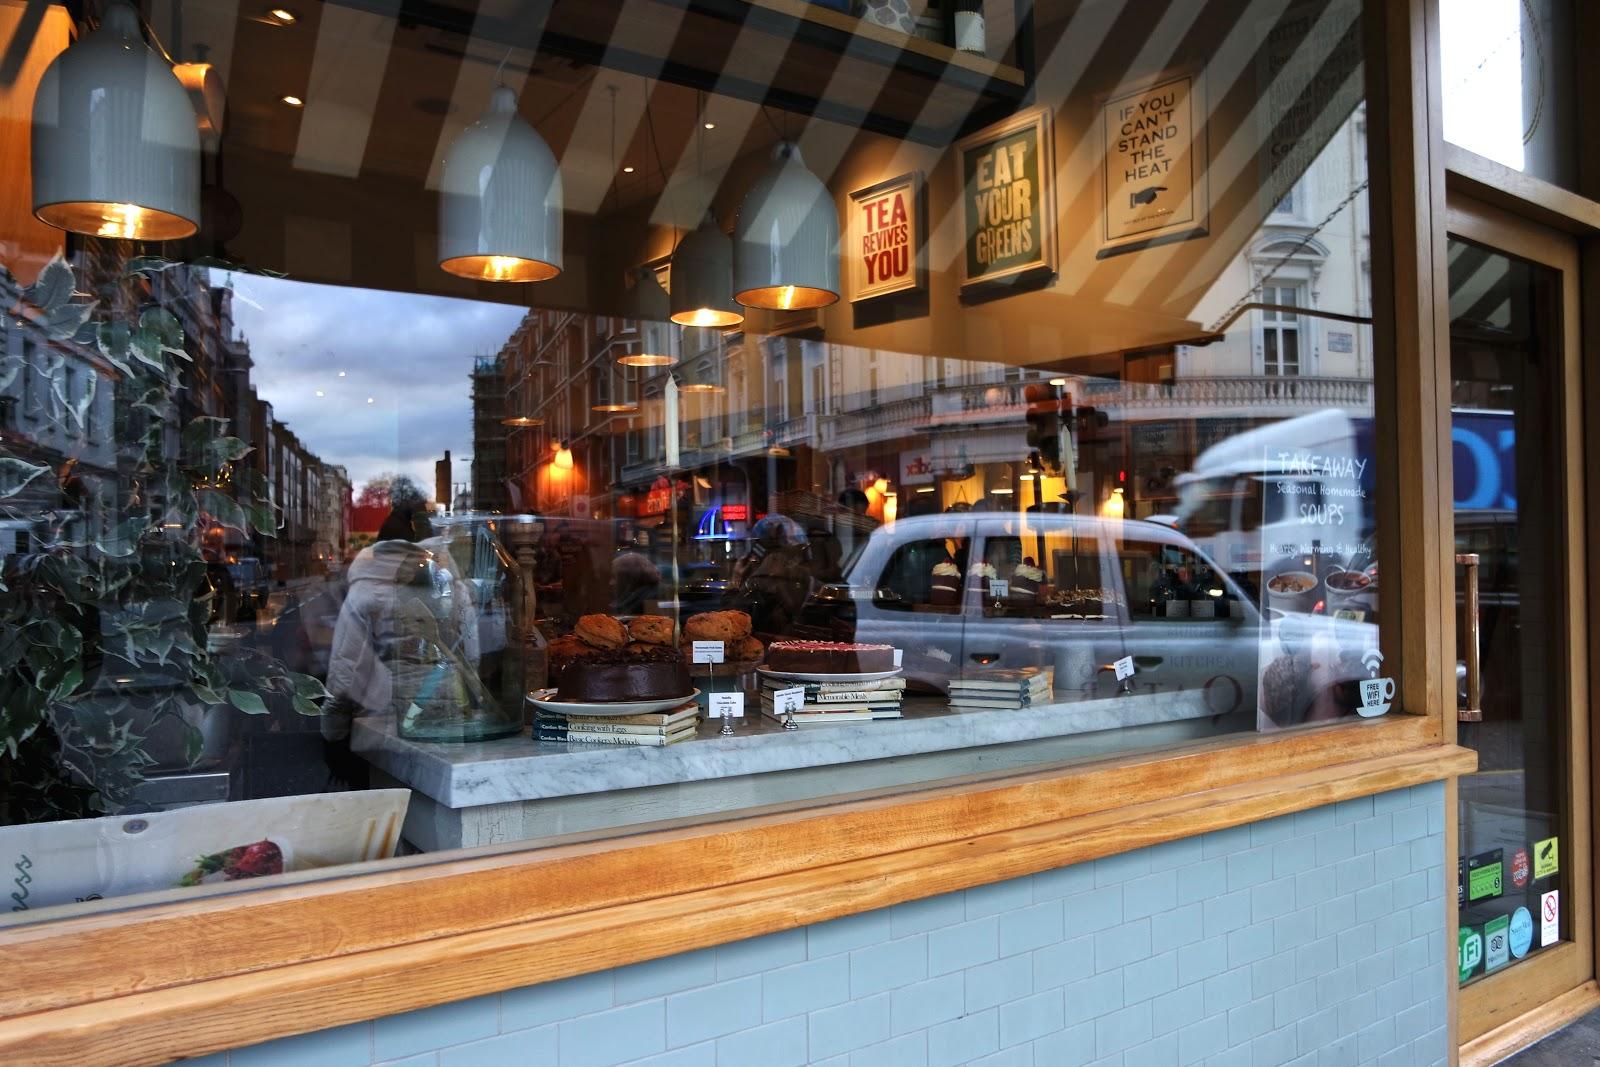 Muriel's Kitchen,cake, milkshake, South Kensington, London, Londres, vlog, blog, travel, travelling, london streets, french,